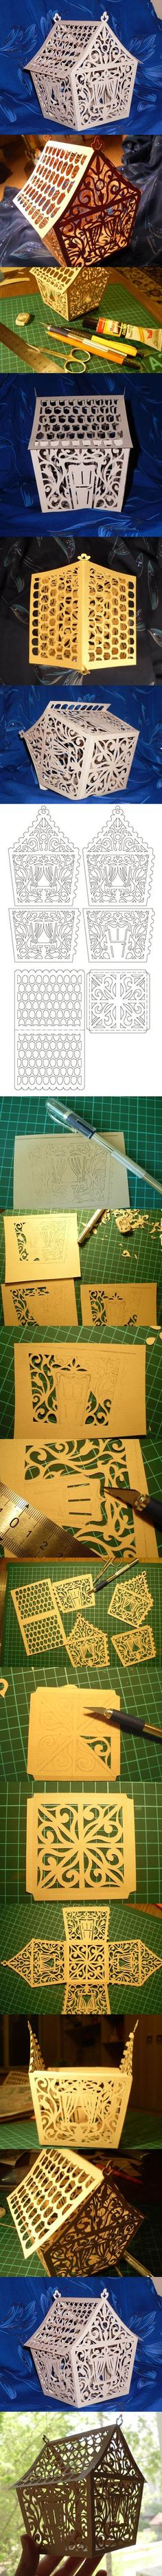 DIY Céu Aberto Paper House 2